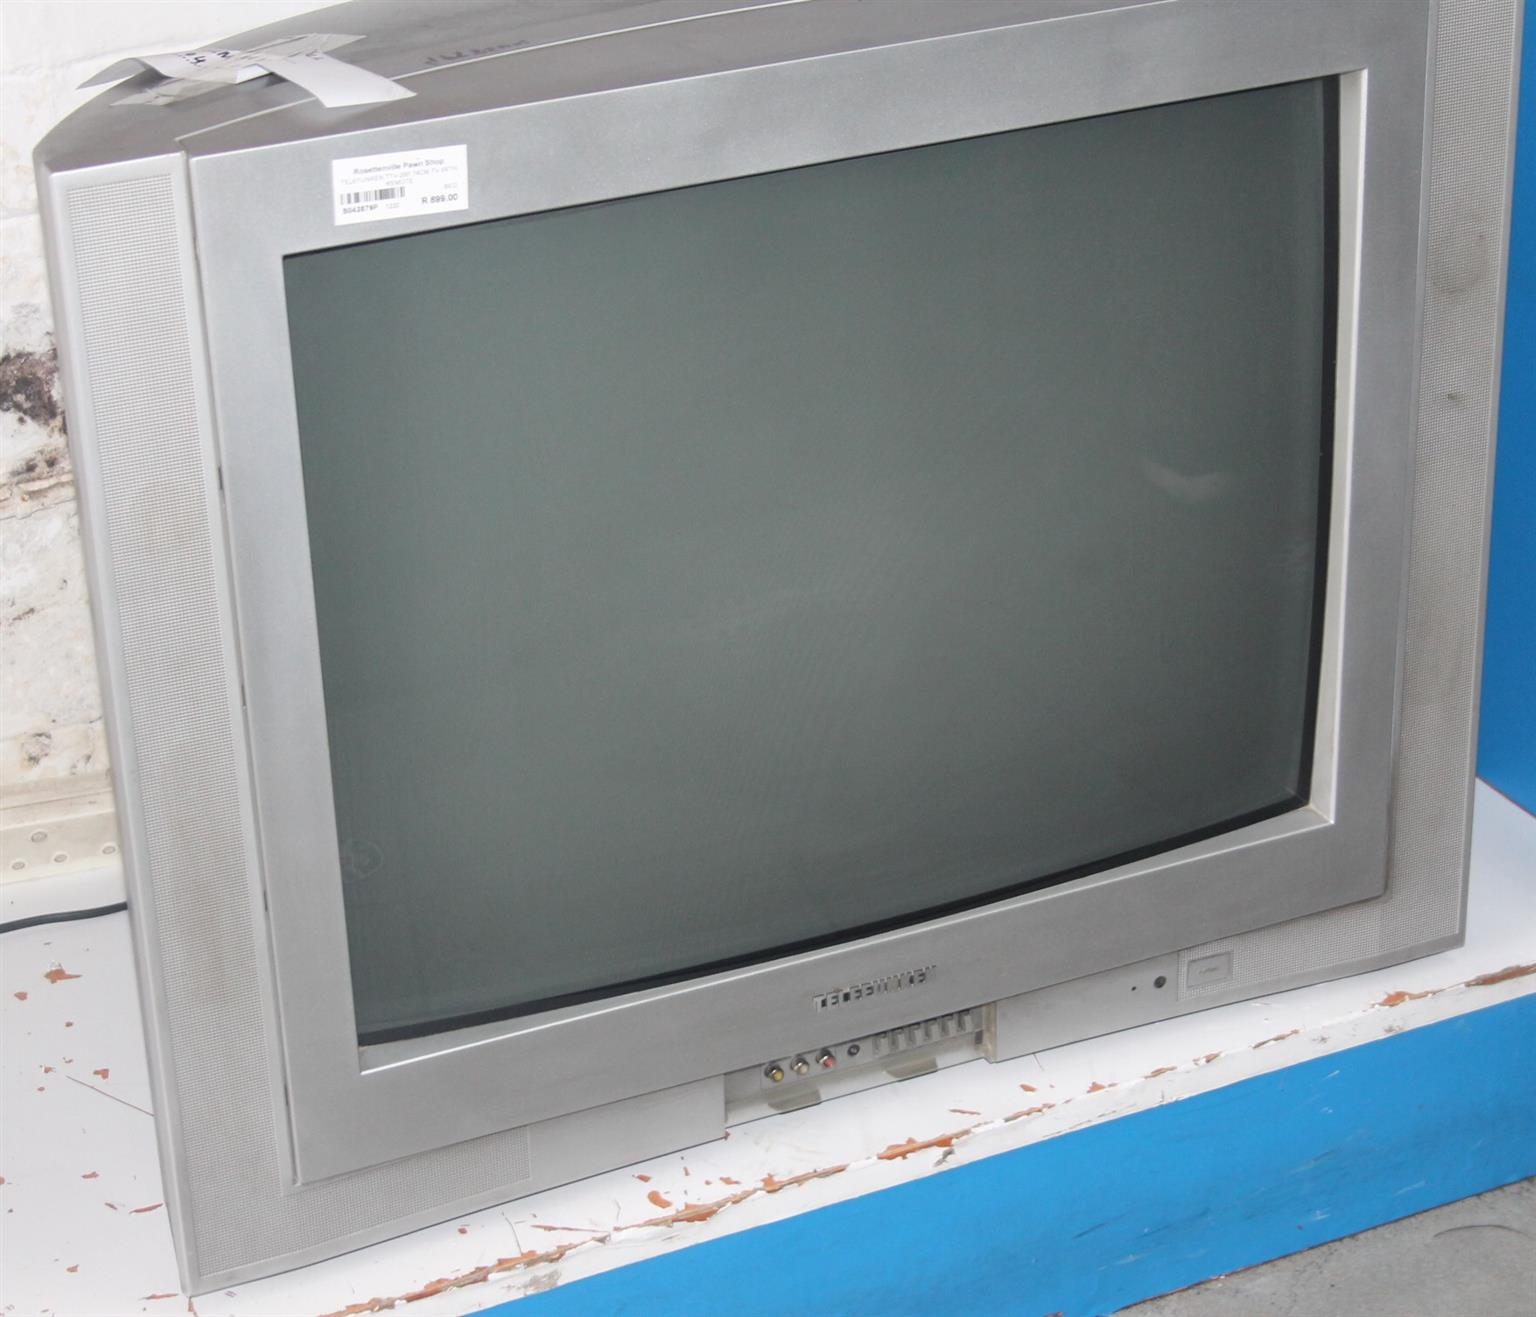 Telefunken 74cm tv with remote S042879P #Rosettenvillepawnshop